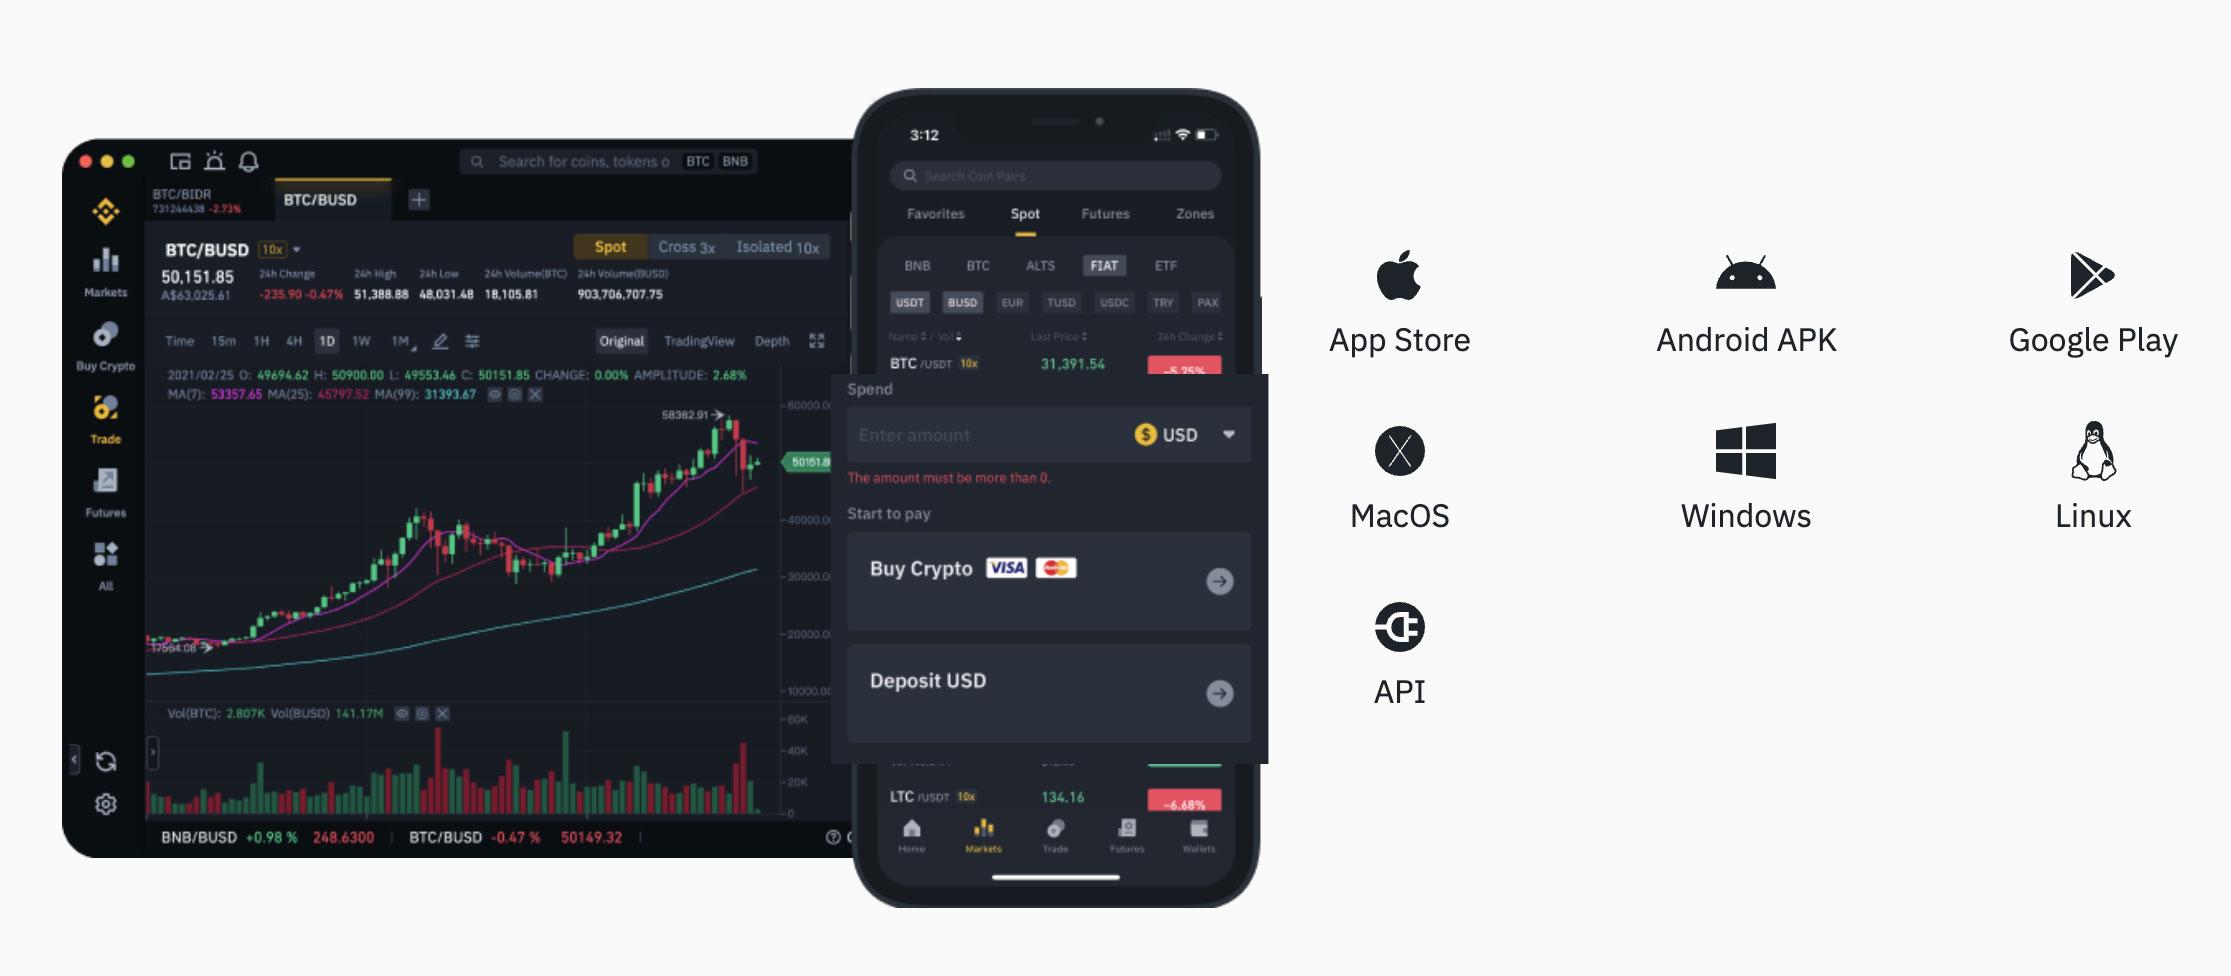 биржа криптовалют binance платформа для торговли